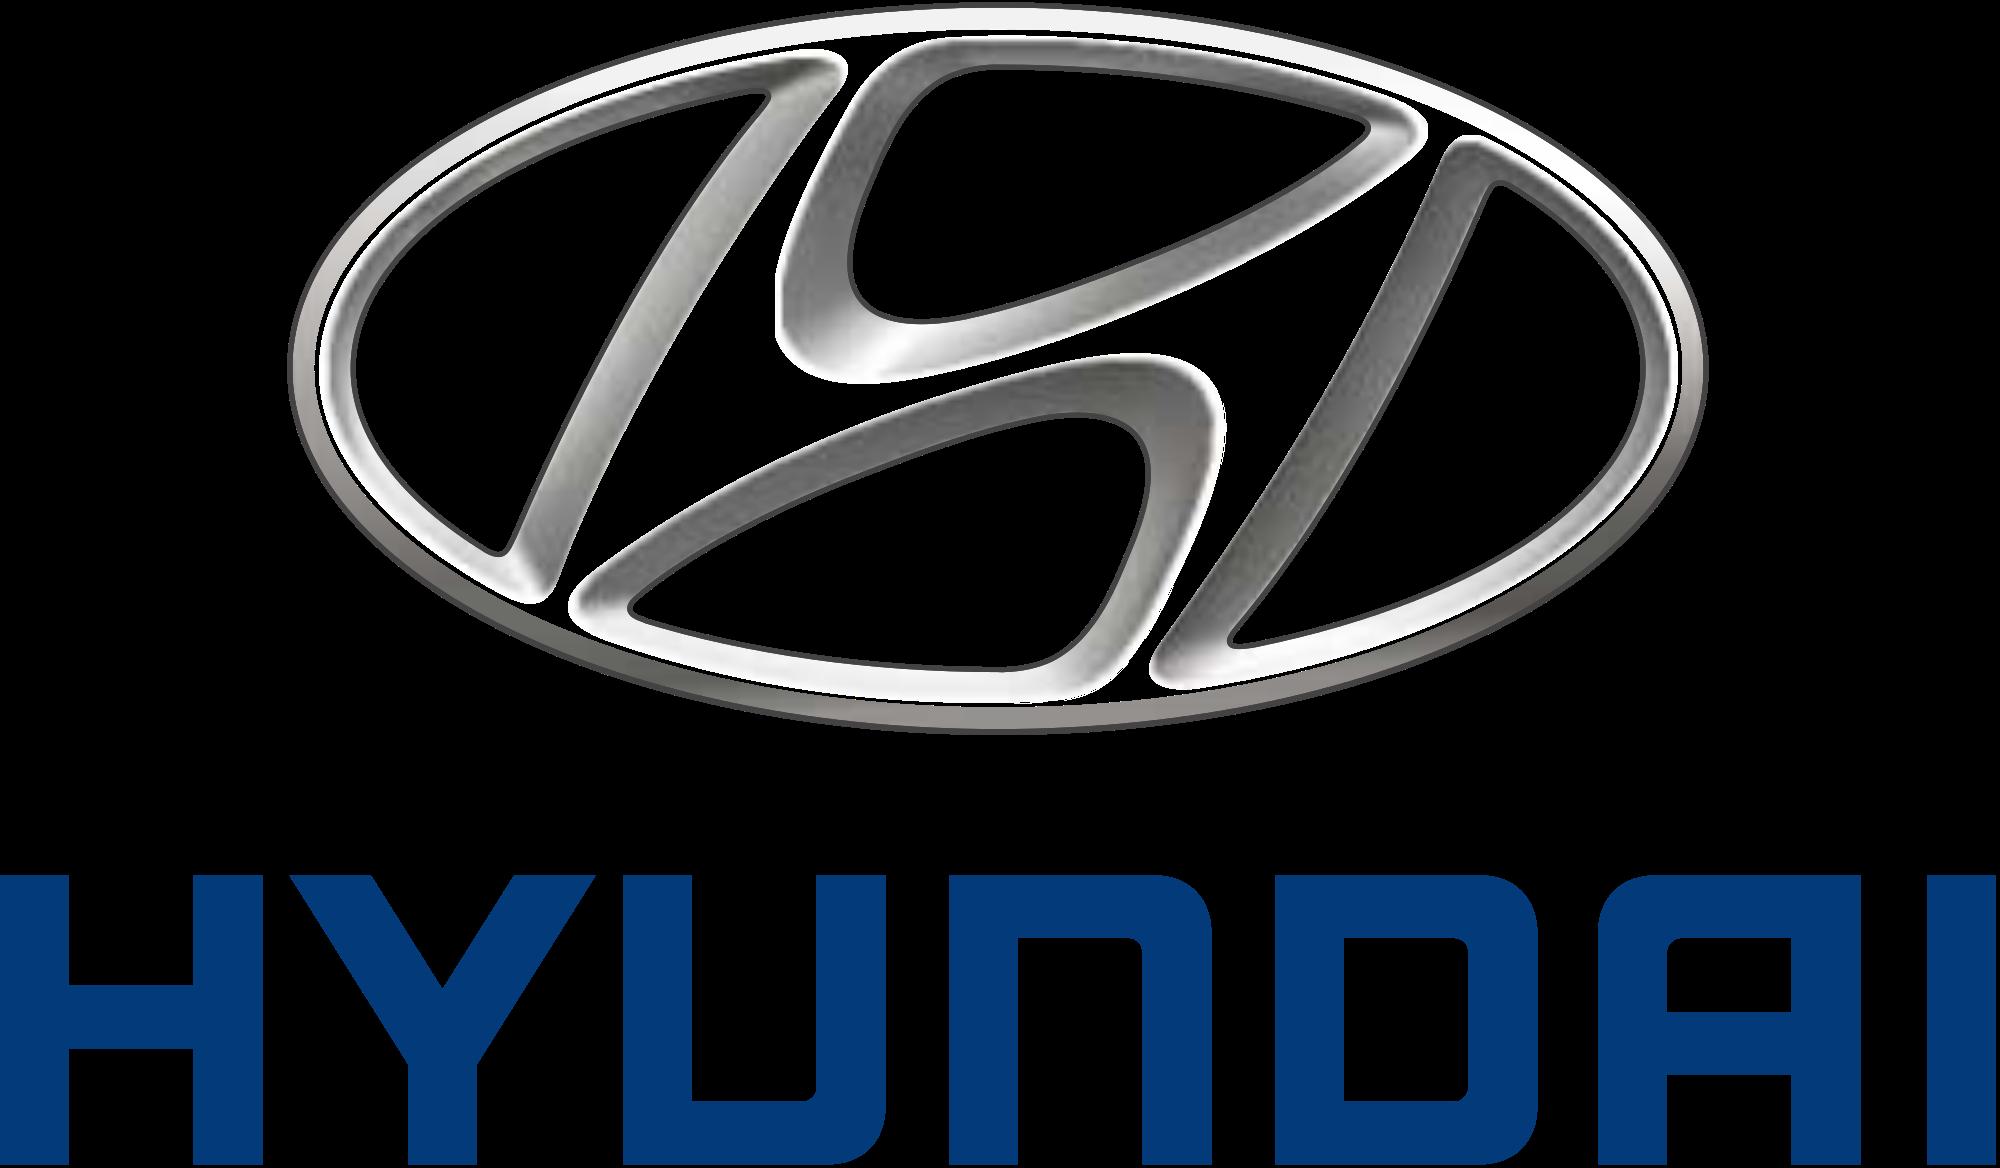 Hyundai Logo Vector Transpa Background Diyloesigns